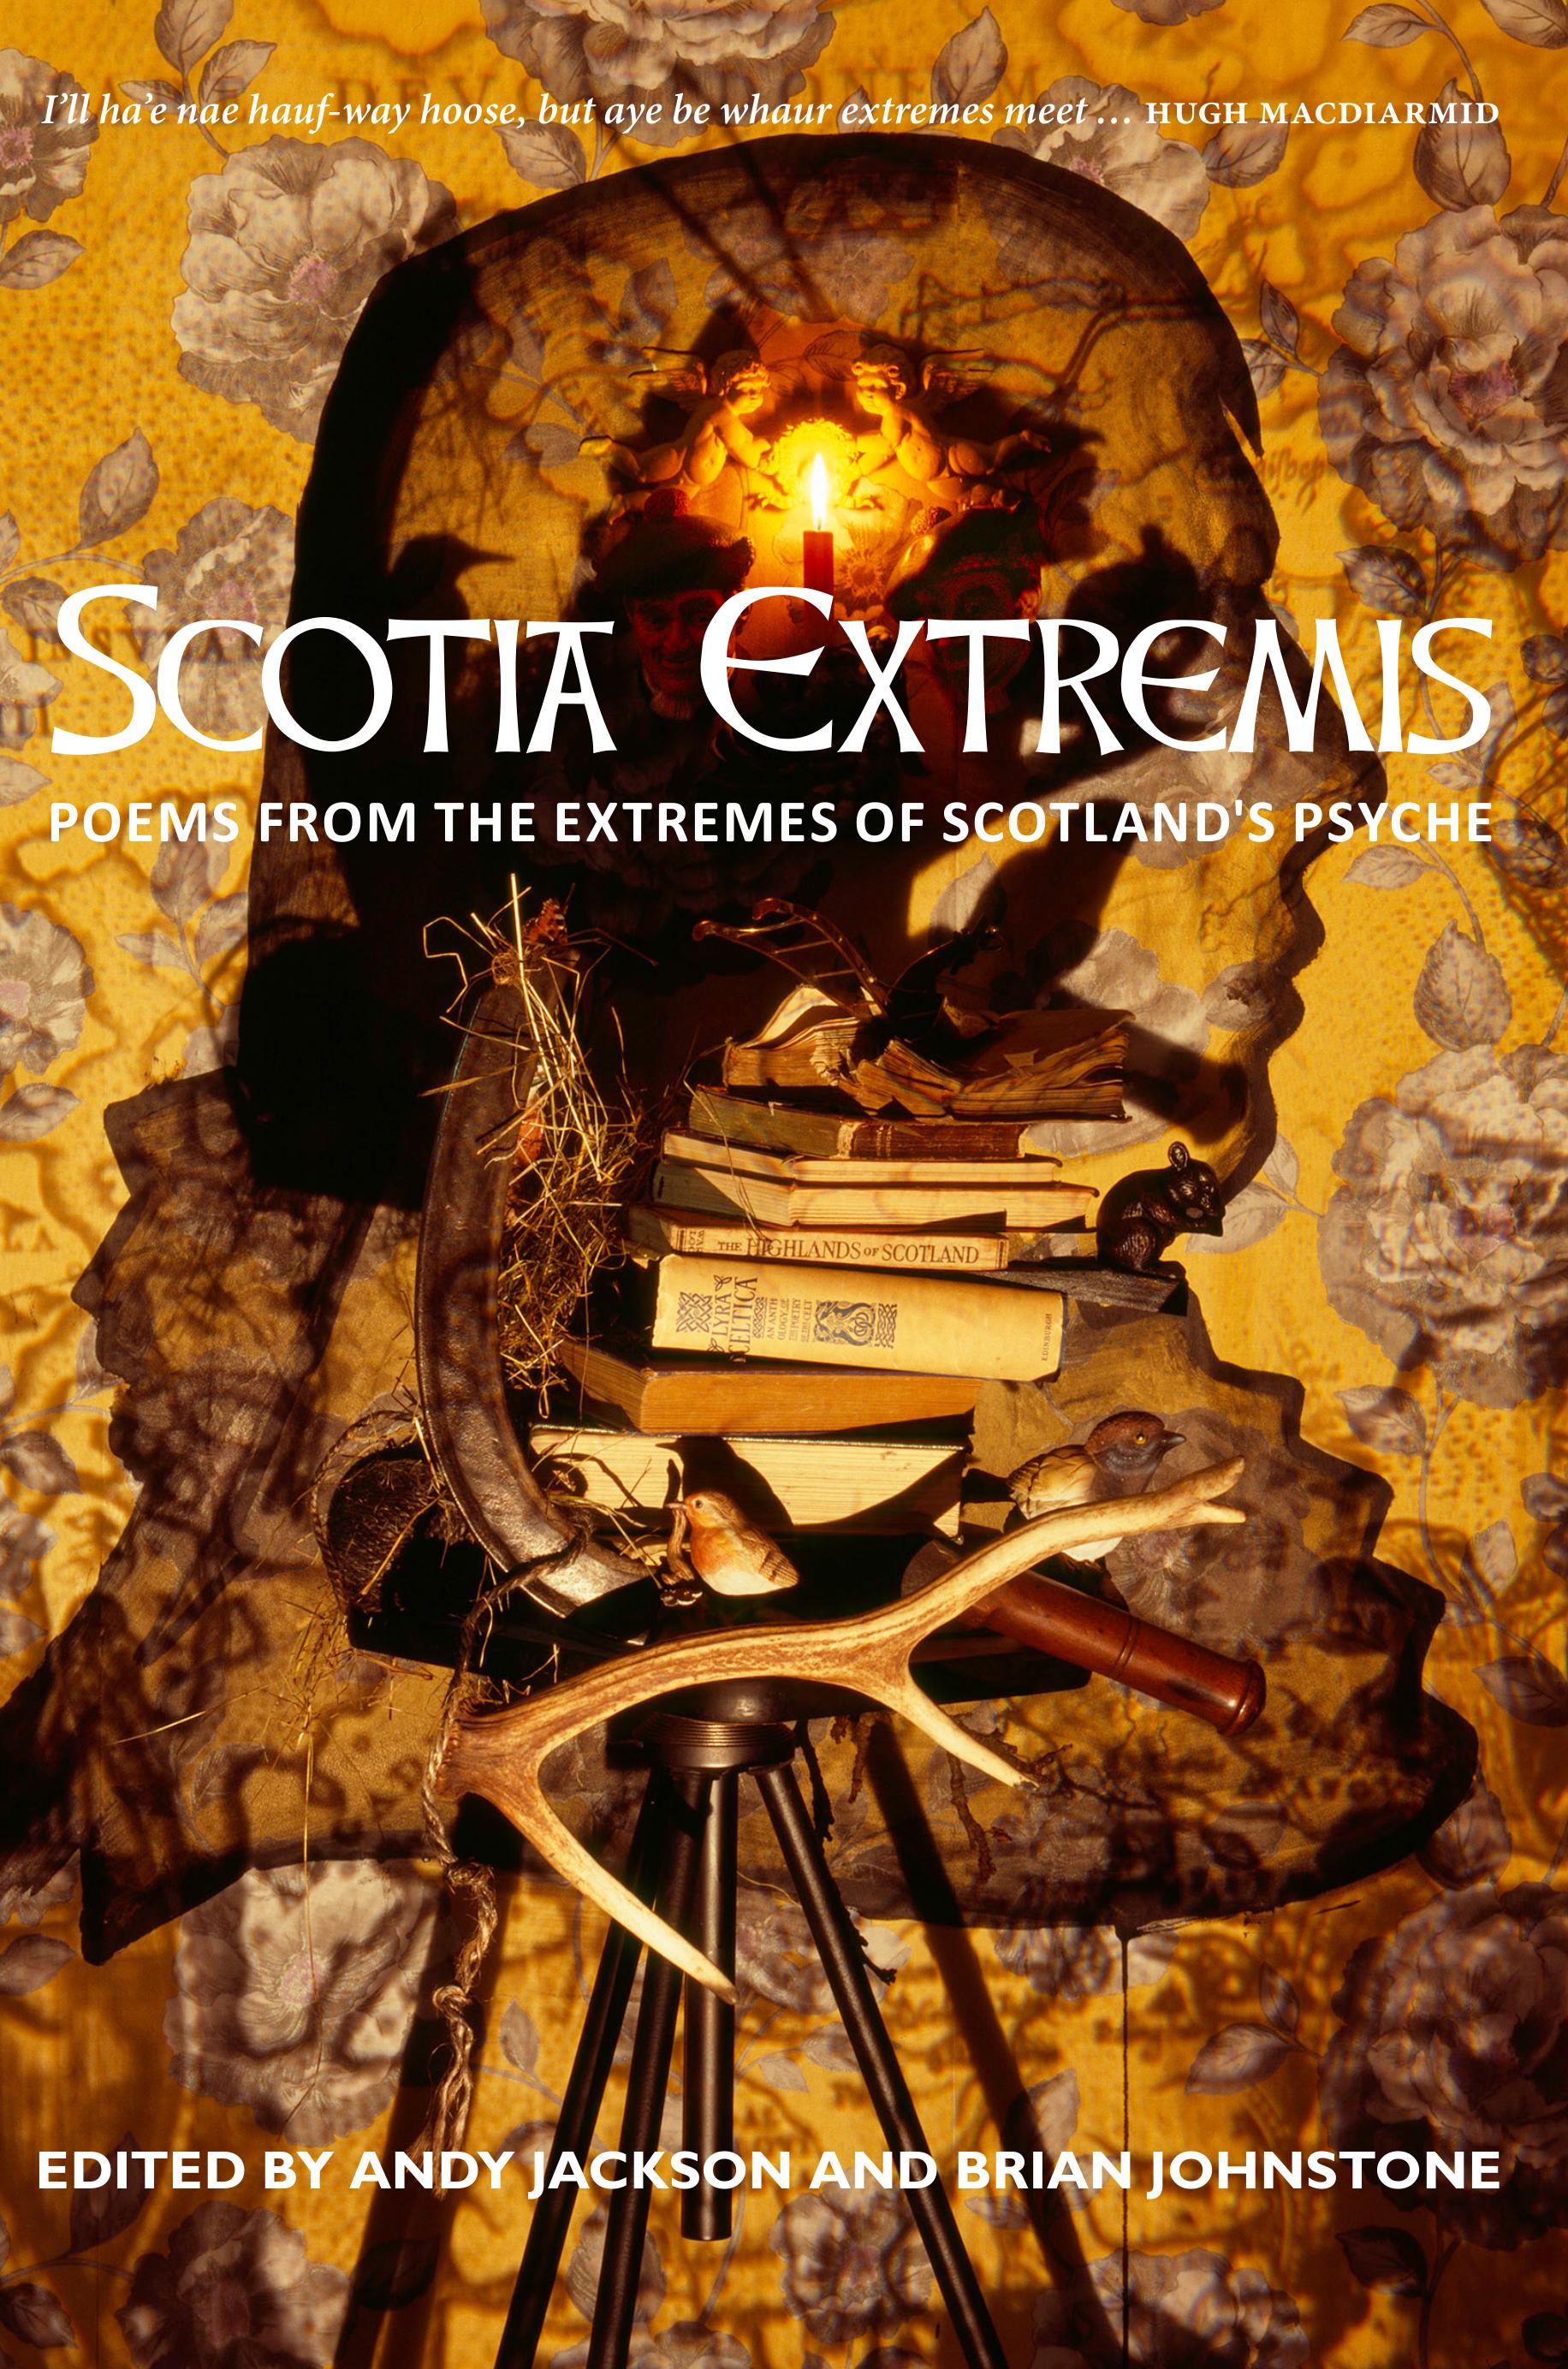 Scotia Extermis Brian Johnstone & Andy Jackson 9781912147564 Luath Press.jpg